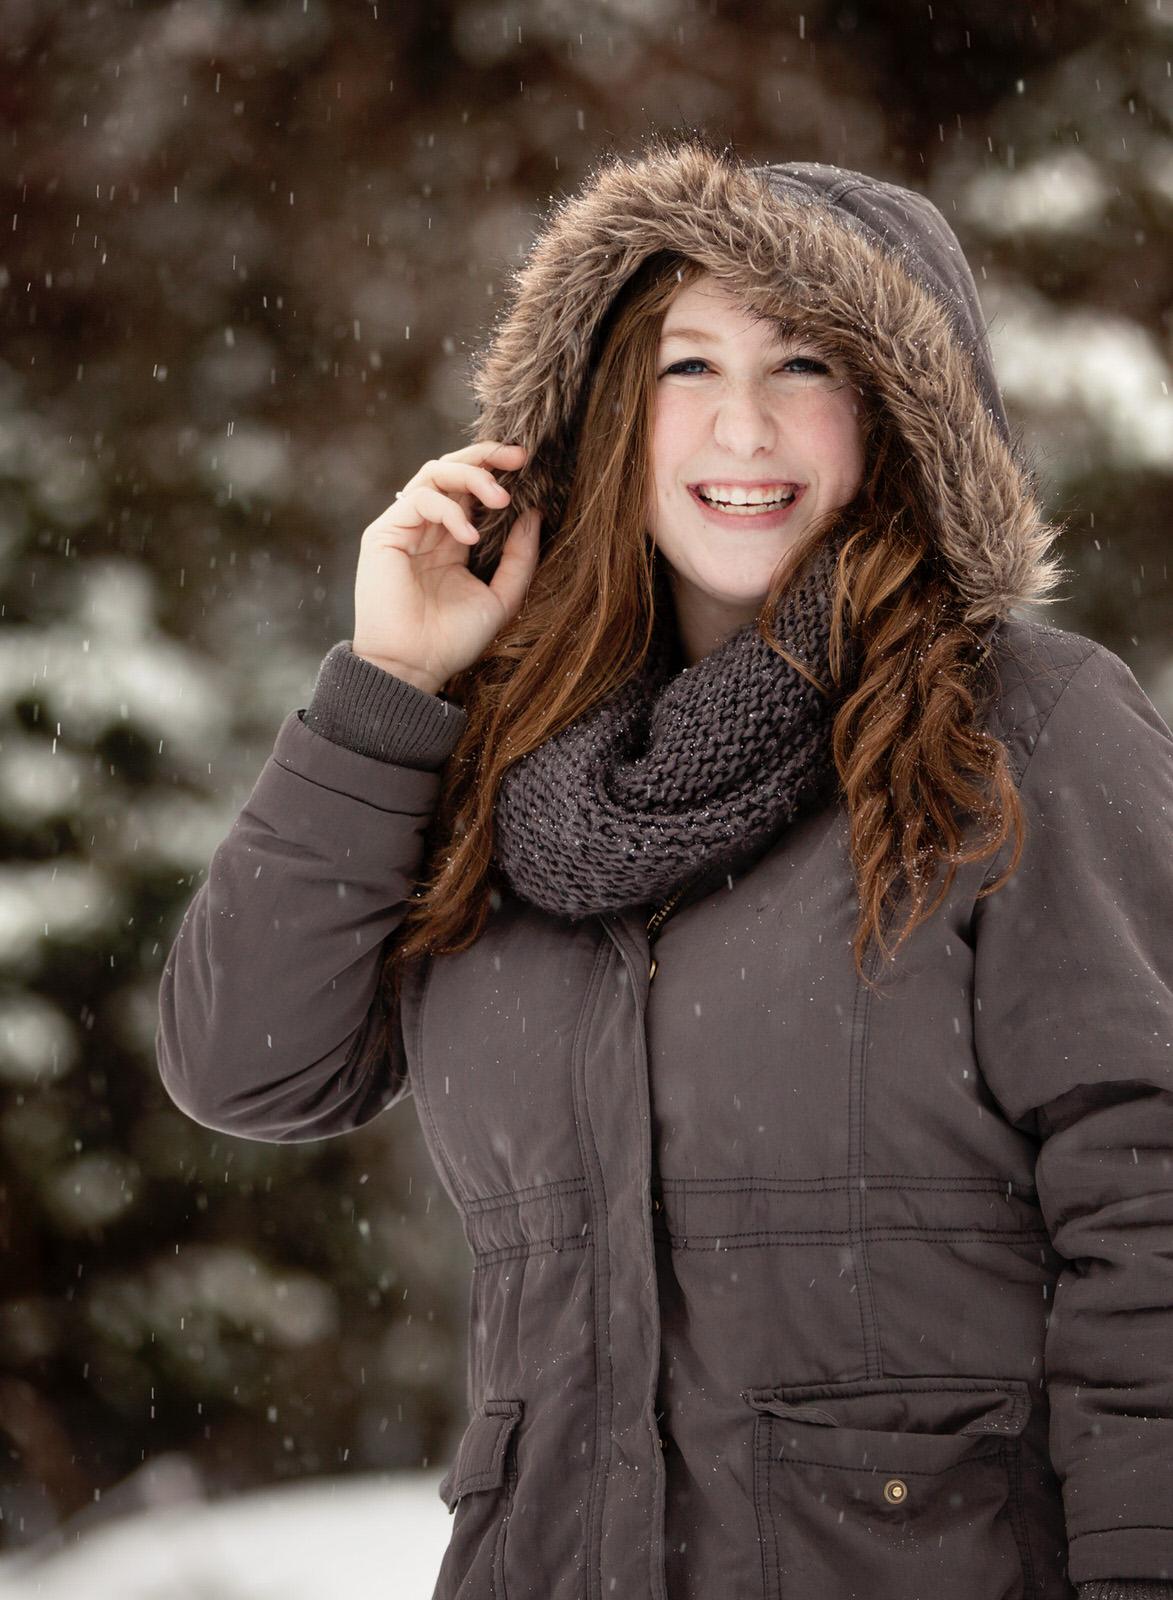 upper-peninsula-photographer-high-school-senior-marquette-ishpeming-negaunee-michigan-jackie-solomon-046.jpg